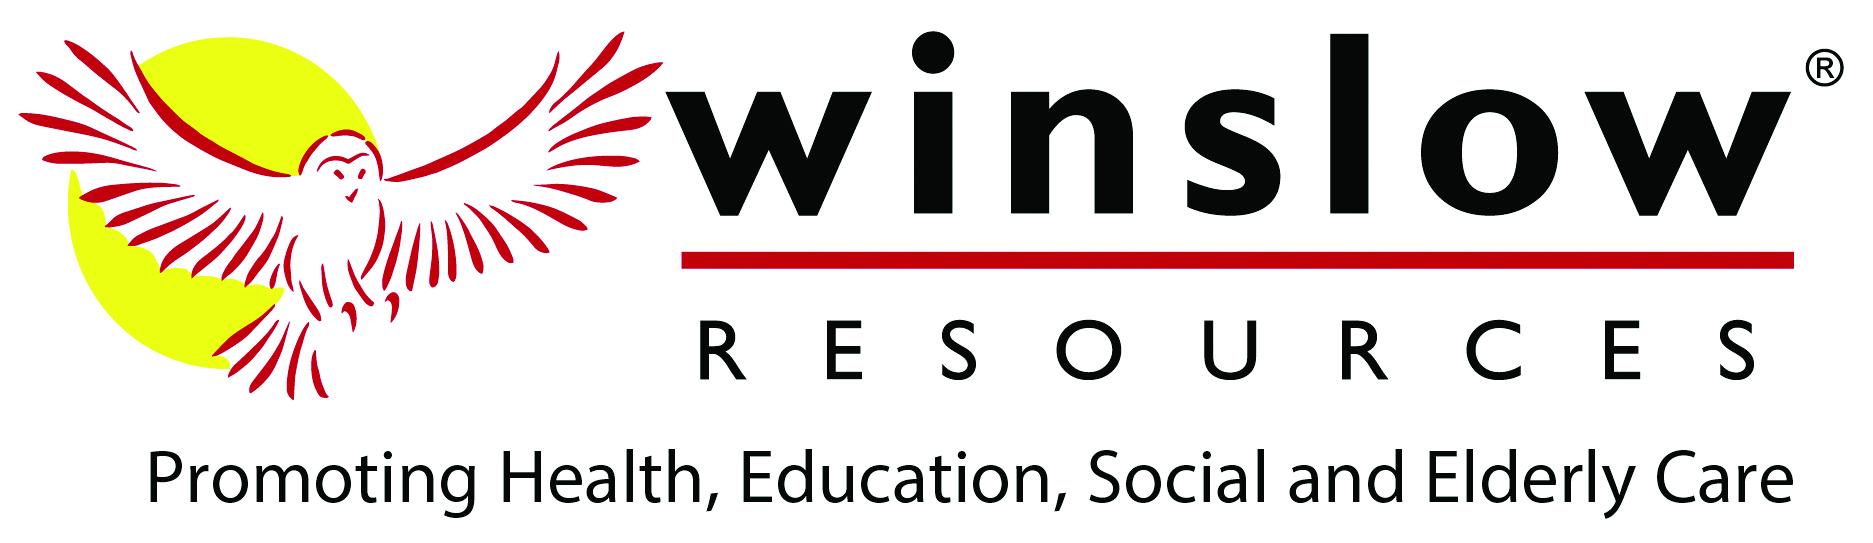 winslow image